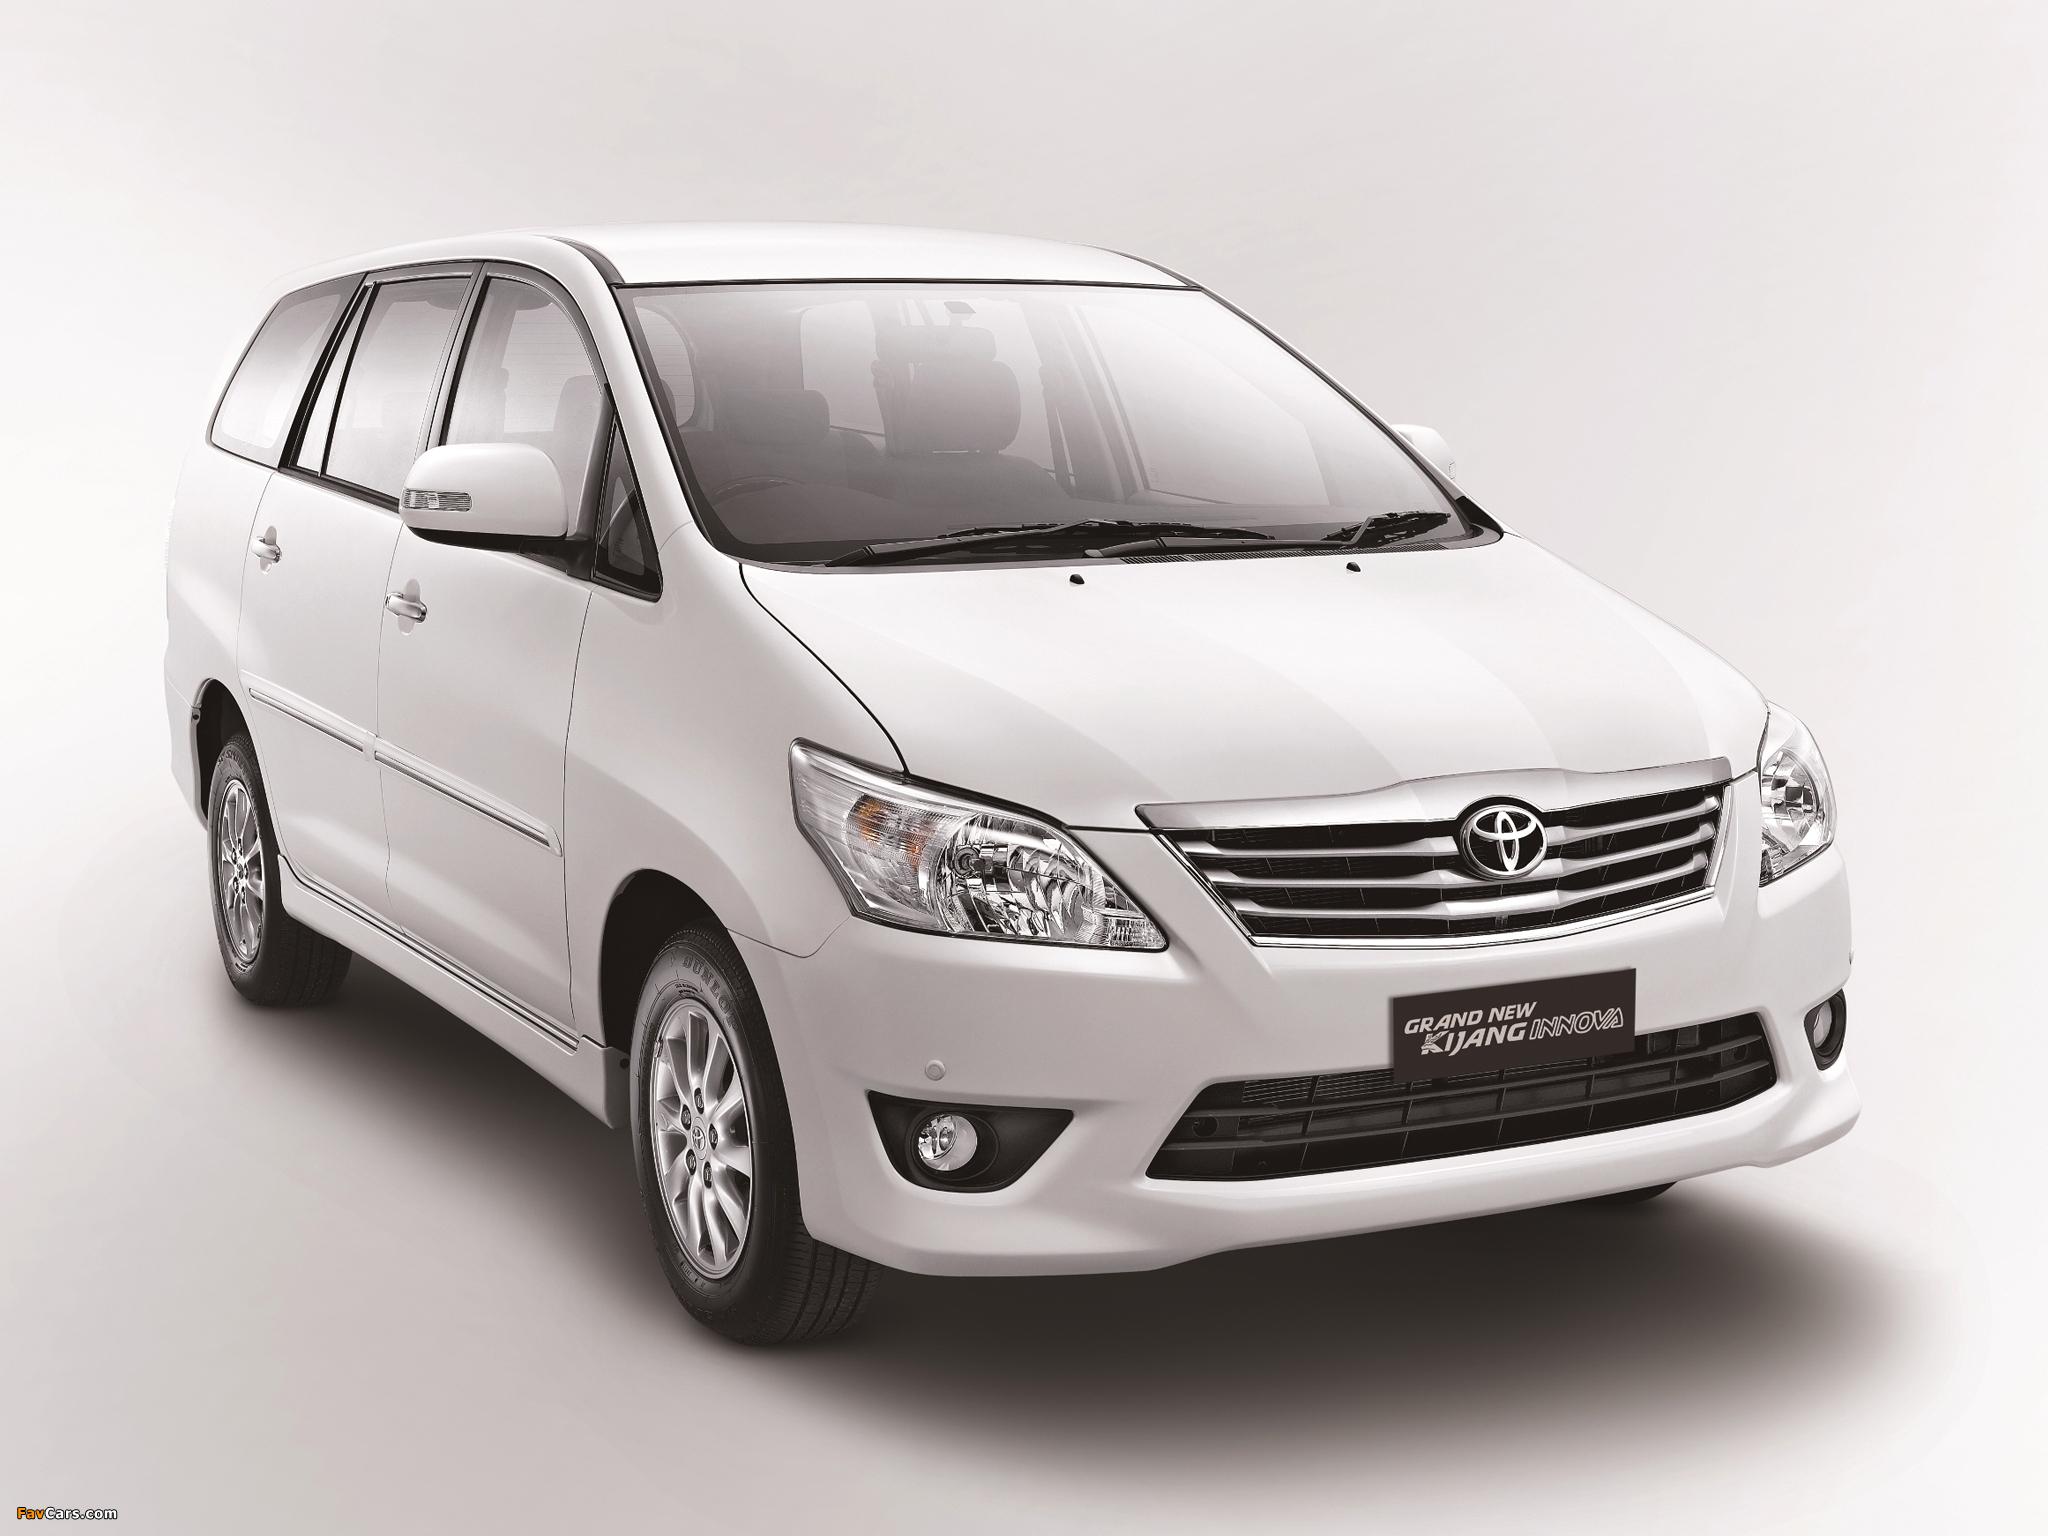 Toyota Grand New Kijang Innova 2011 Wallpapers 2048x1536